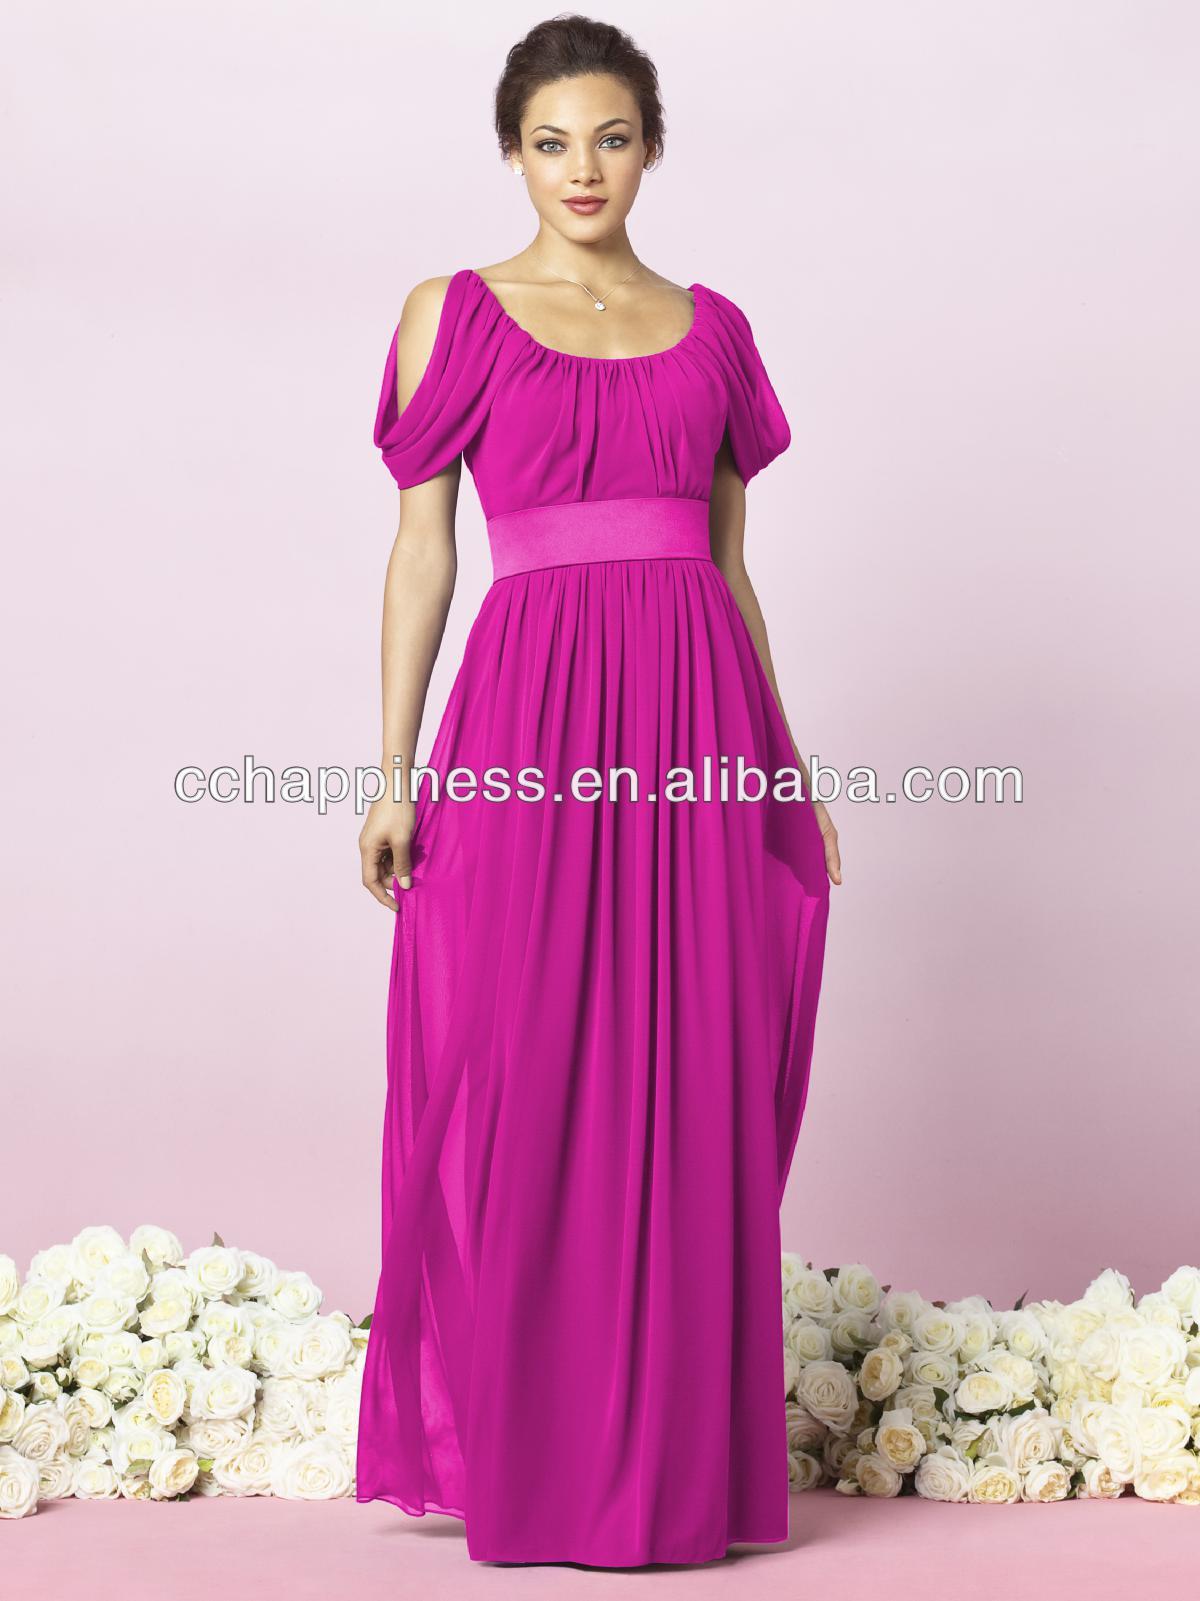 Design Your Prom Dress Online